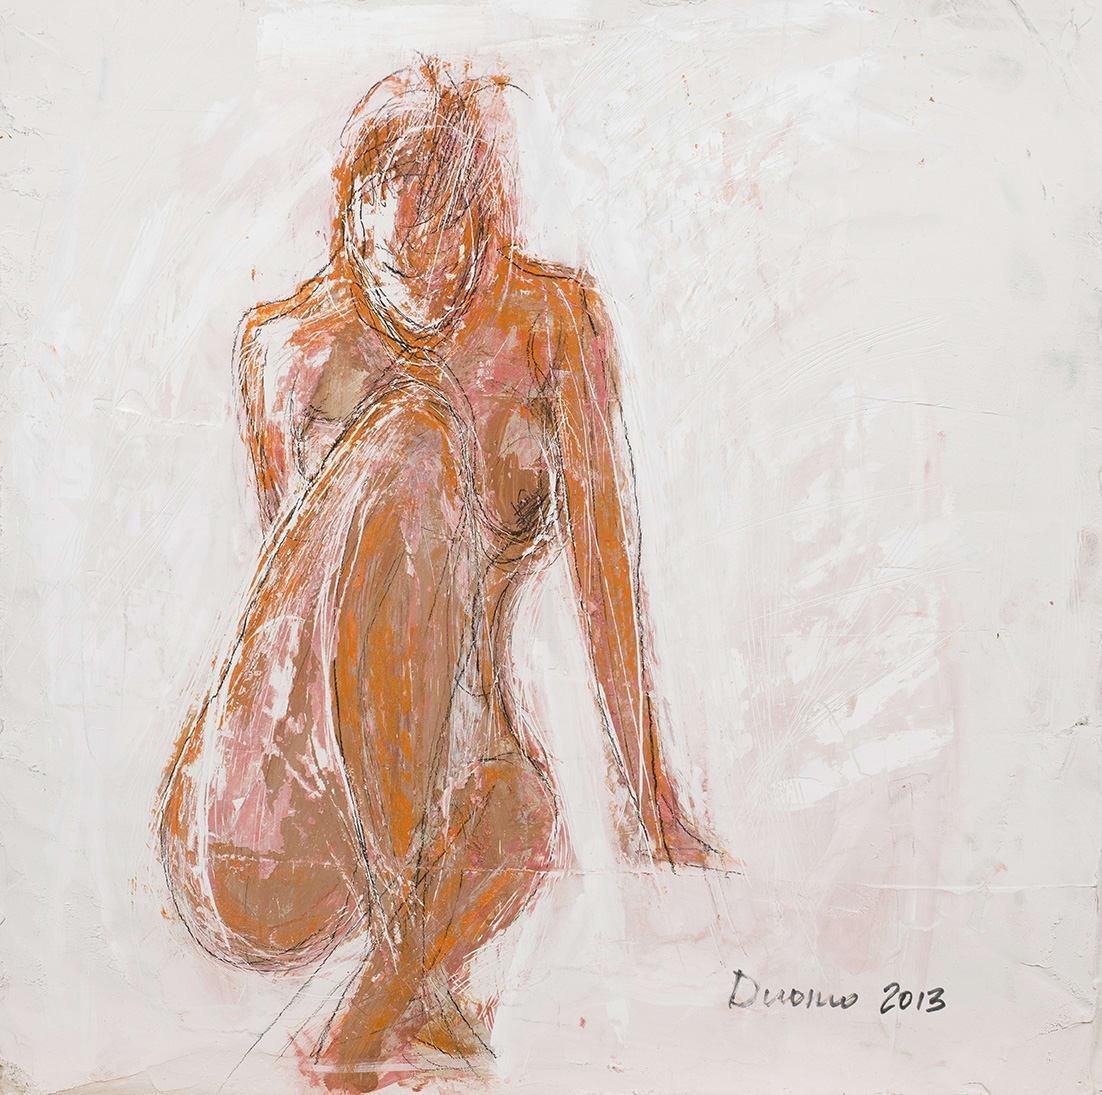 "<span class=""link fancybox-details-link""><a href=""/artworks/1535-emilio-diiorio-2013/"">View Detail Page</a></span><div class=""artist""><strong>Emilio DiIorio</strong></div> 2013 <div class=""medium"">acrylic on plaster</div> <div class=""dimensions"">24 x 24""</div><div class=""copyright_line"">Copyright The Artist</div>"